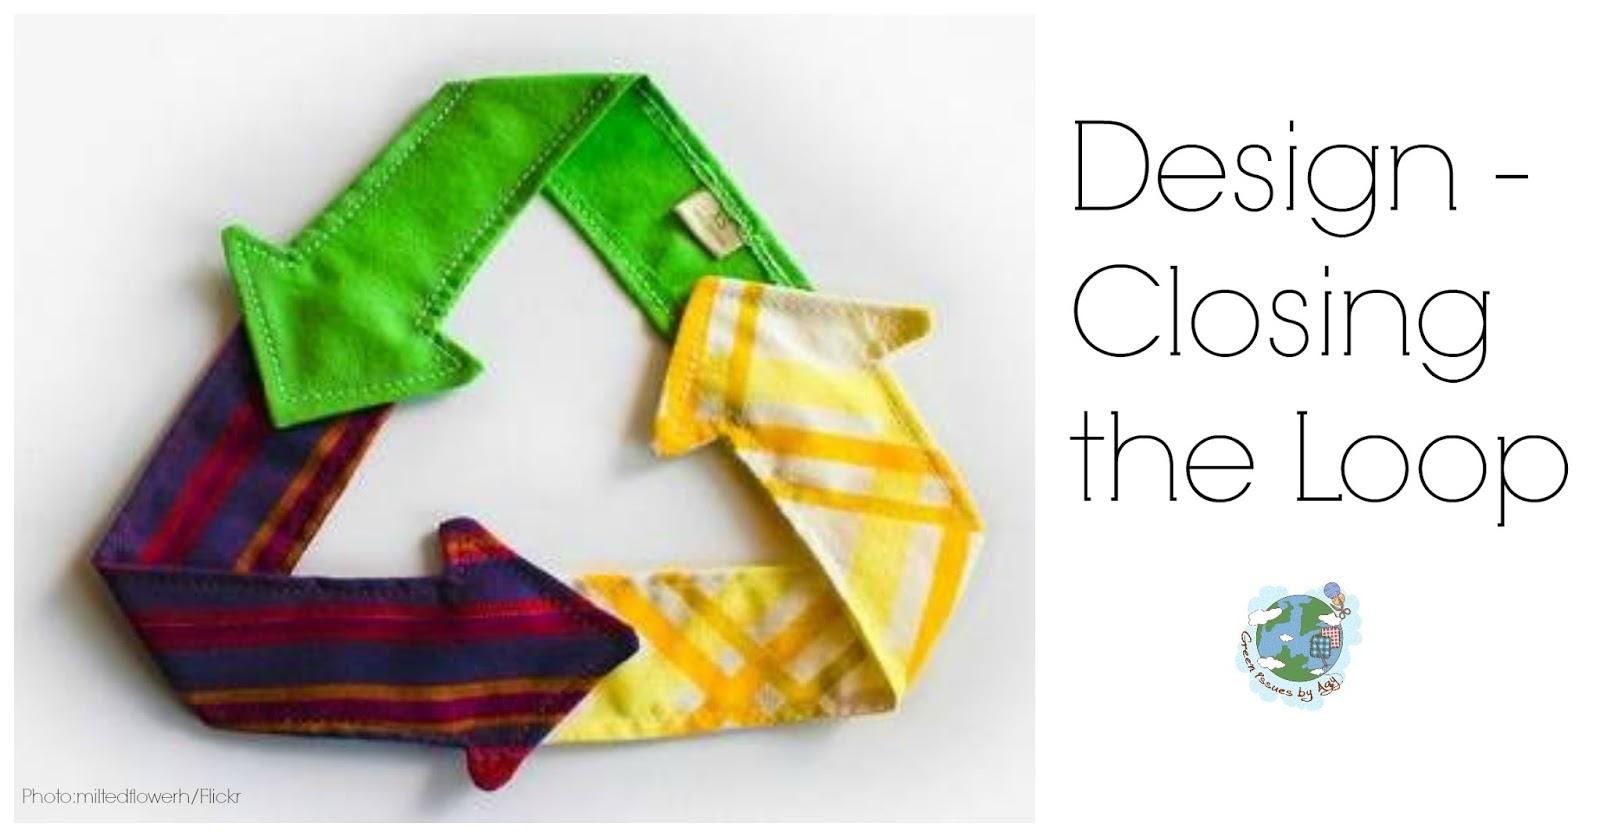 Design - Closing the Loop